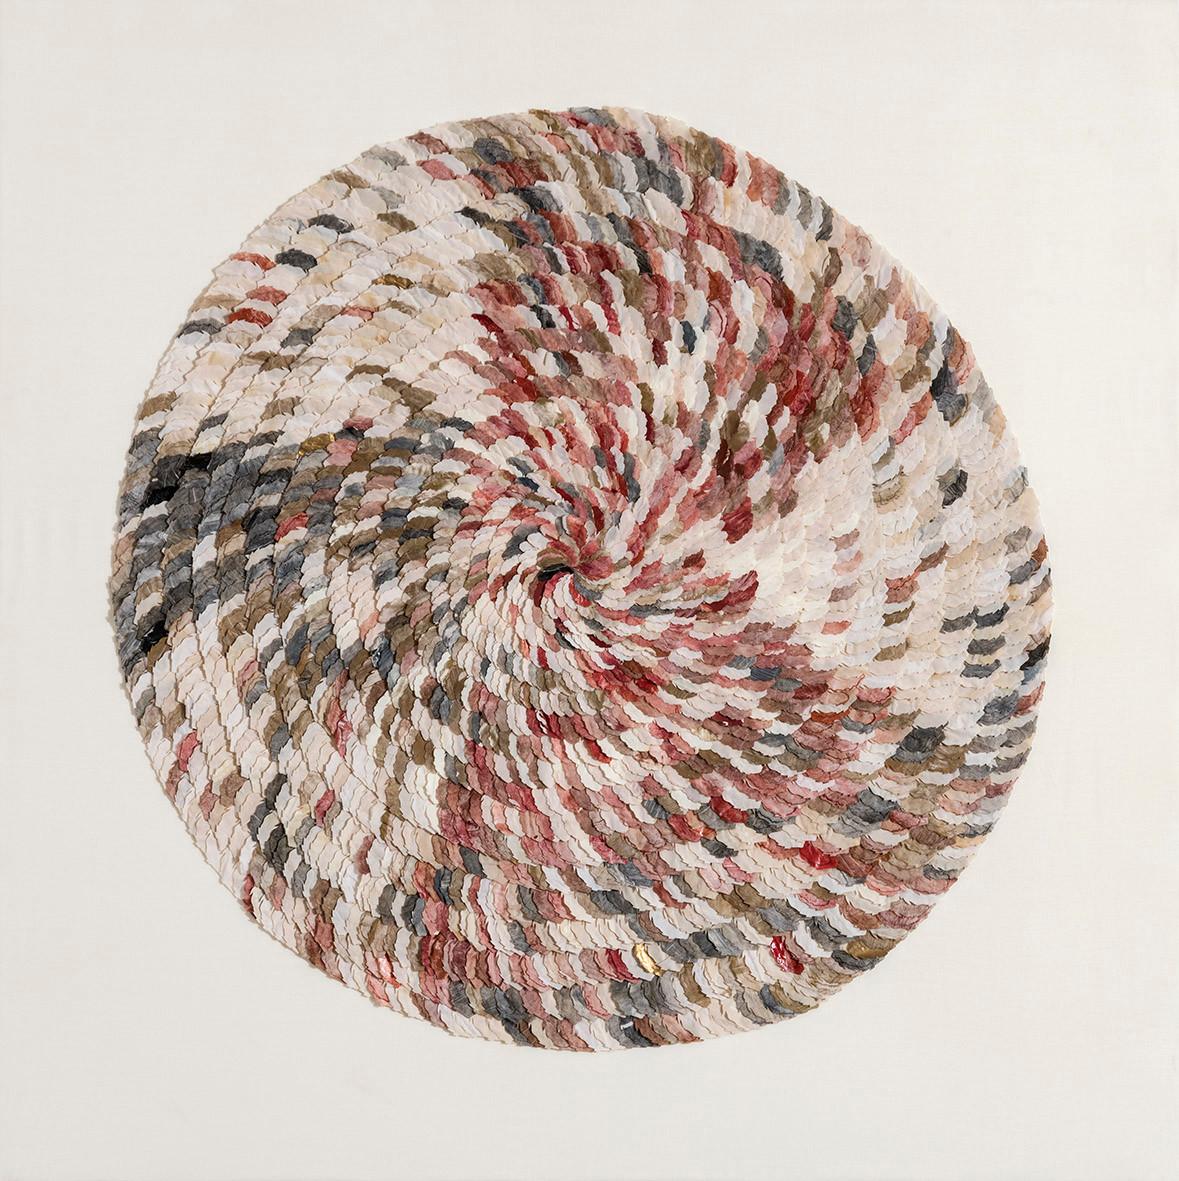 Picus viridis feather/2017/120x120 cm